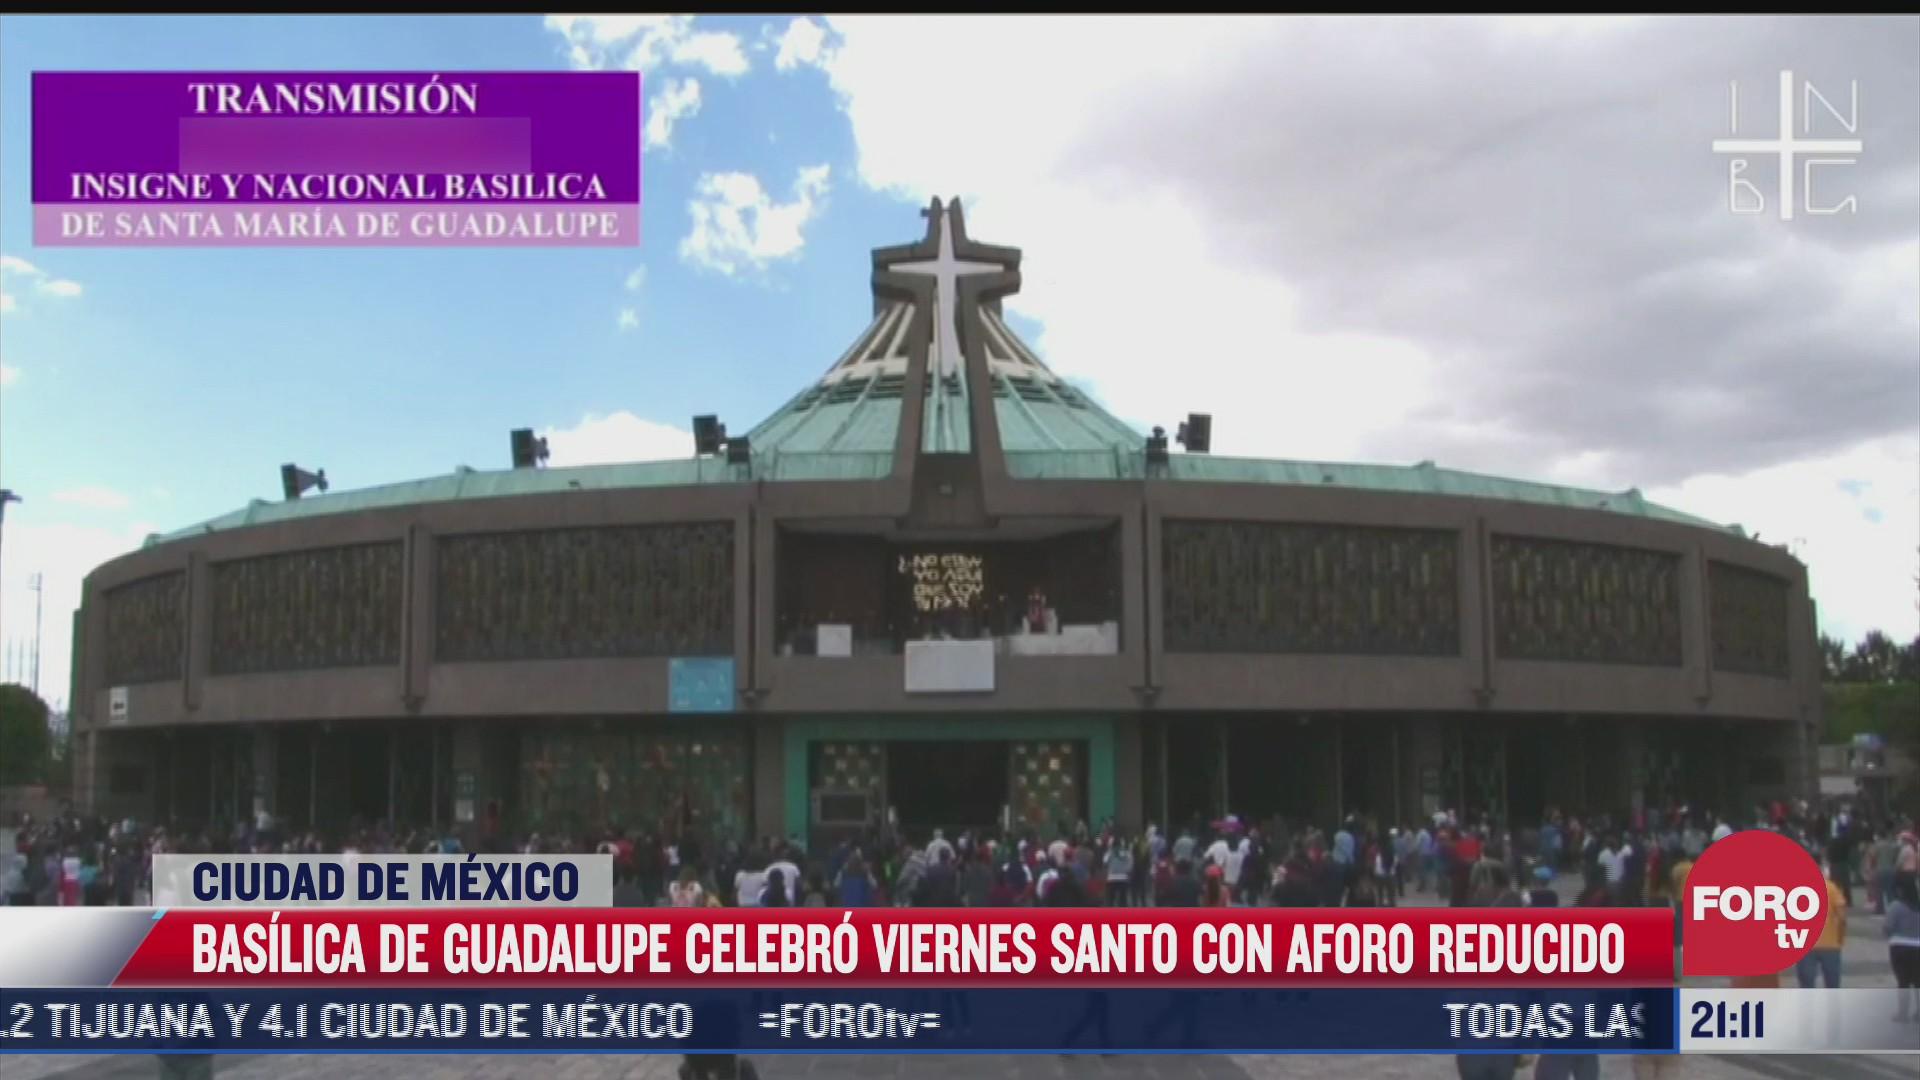 basilica de guadalupe celebro viernes santo con aforo reducido